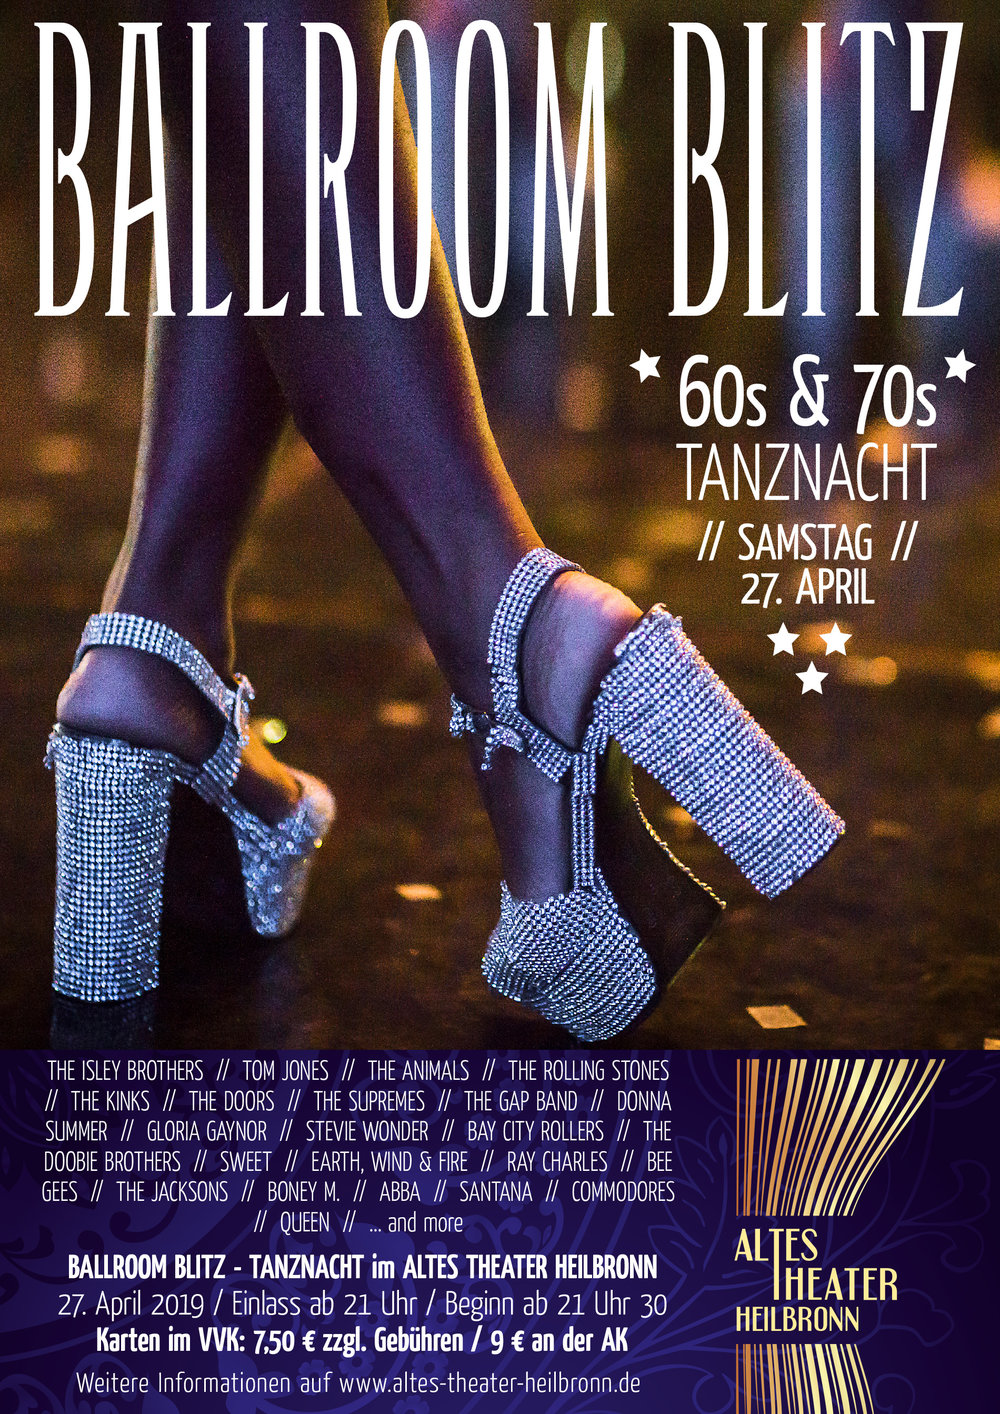 Ballroom-Blitz-Tanzparty-im-ALTES-THEATER.jpg